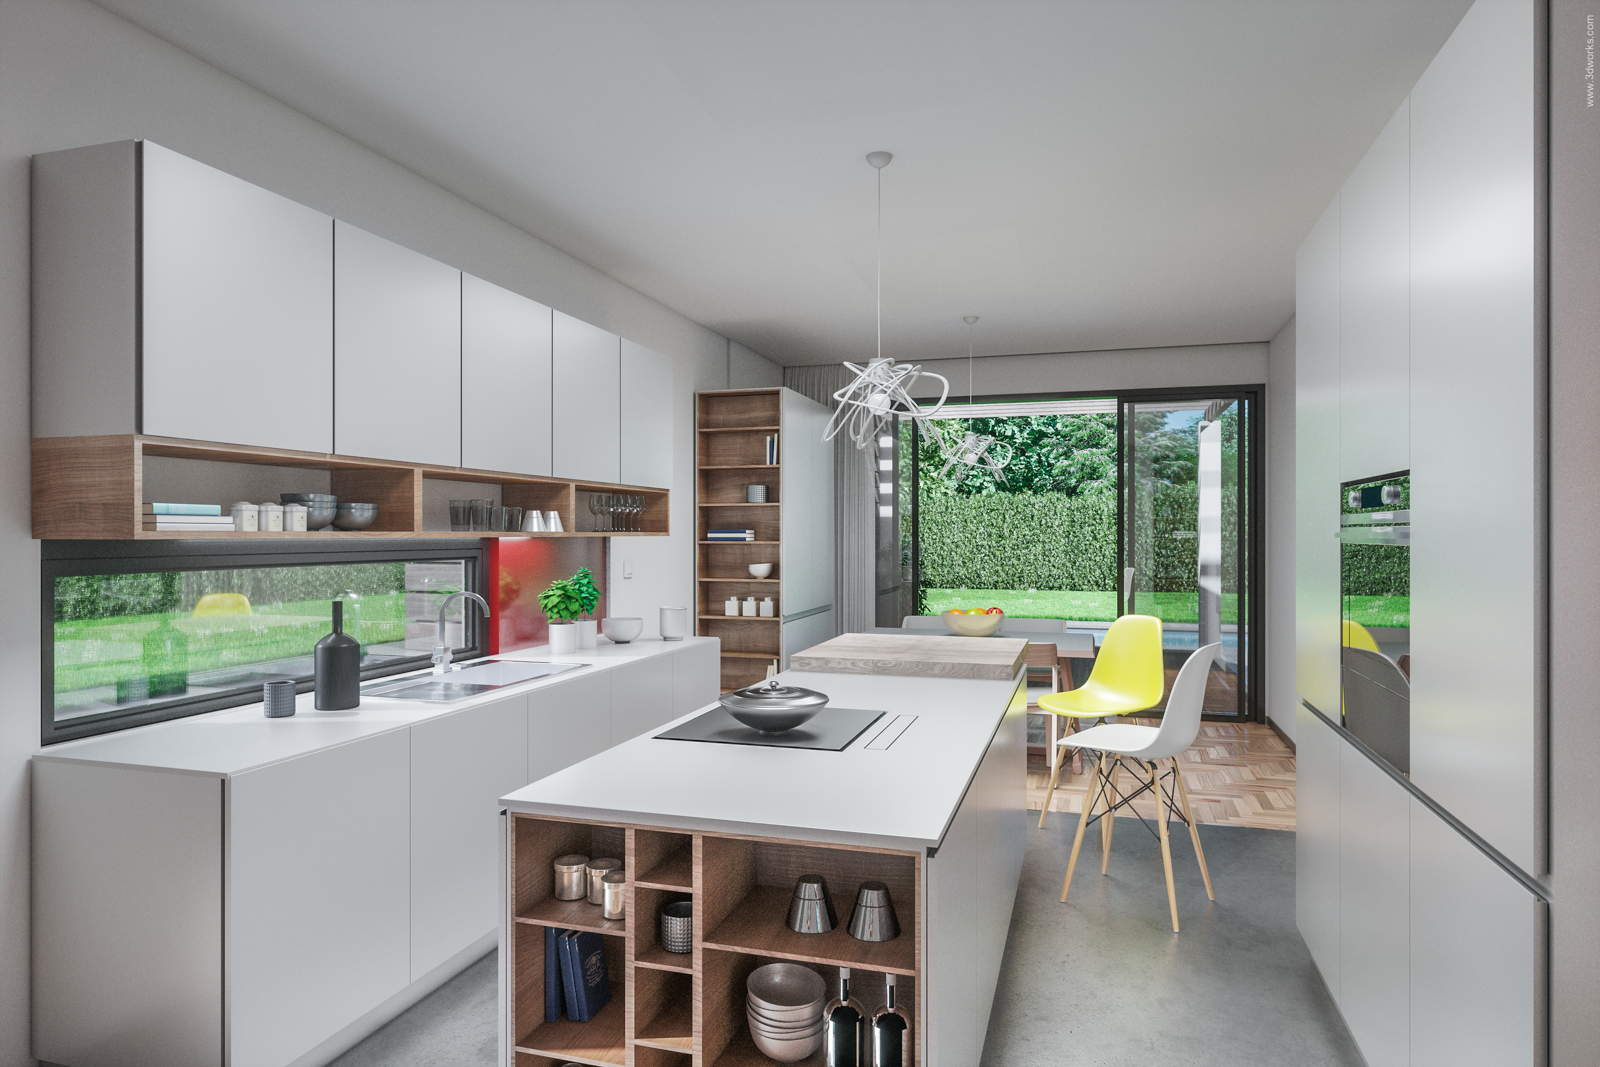 Kücheninterieur - Pool House